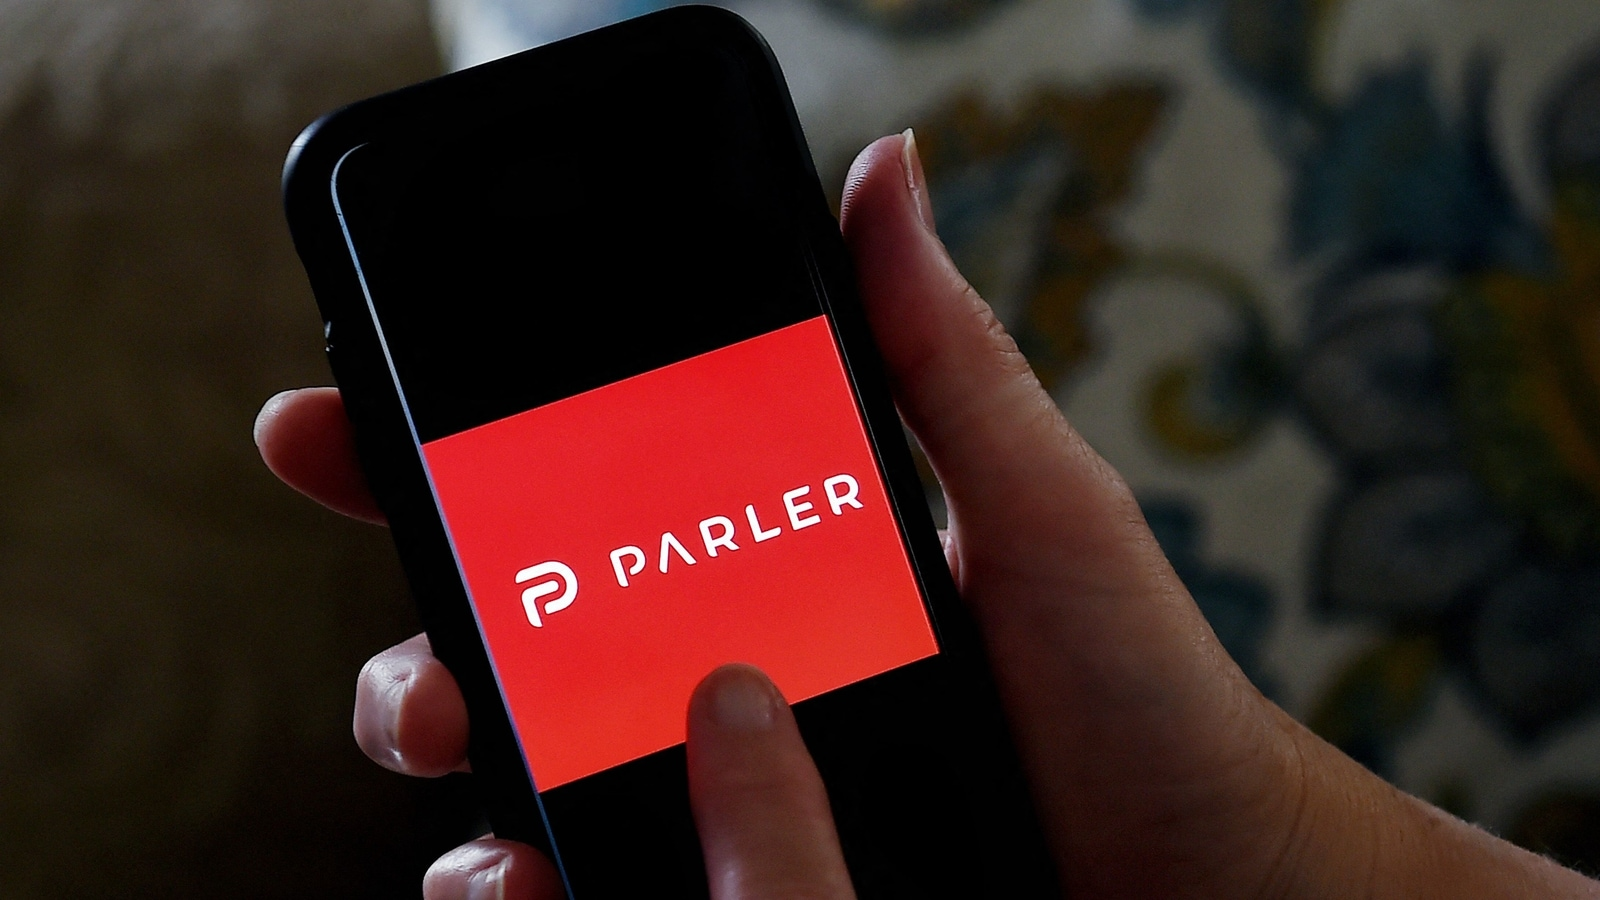 Parler returns to Apple's App Store, names new CEO - Marketshockers